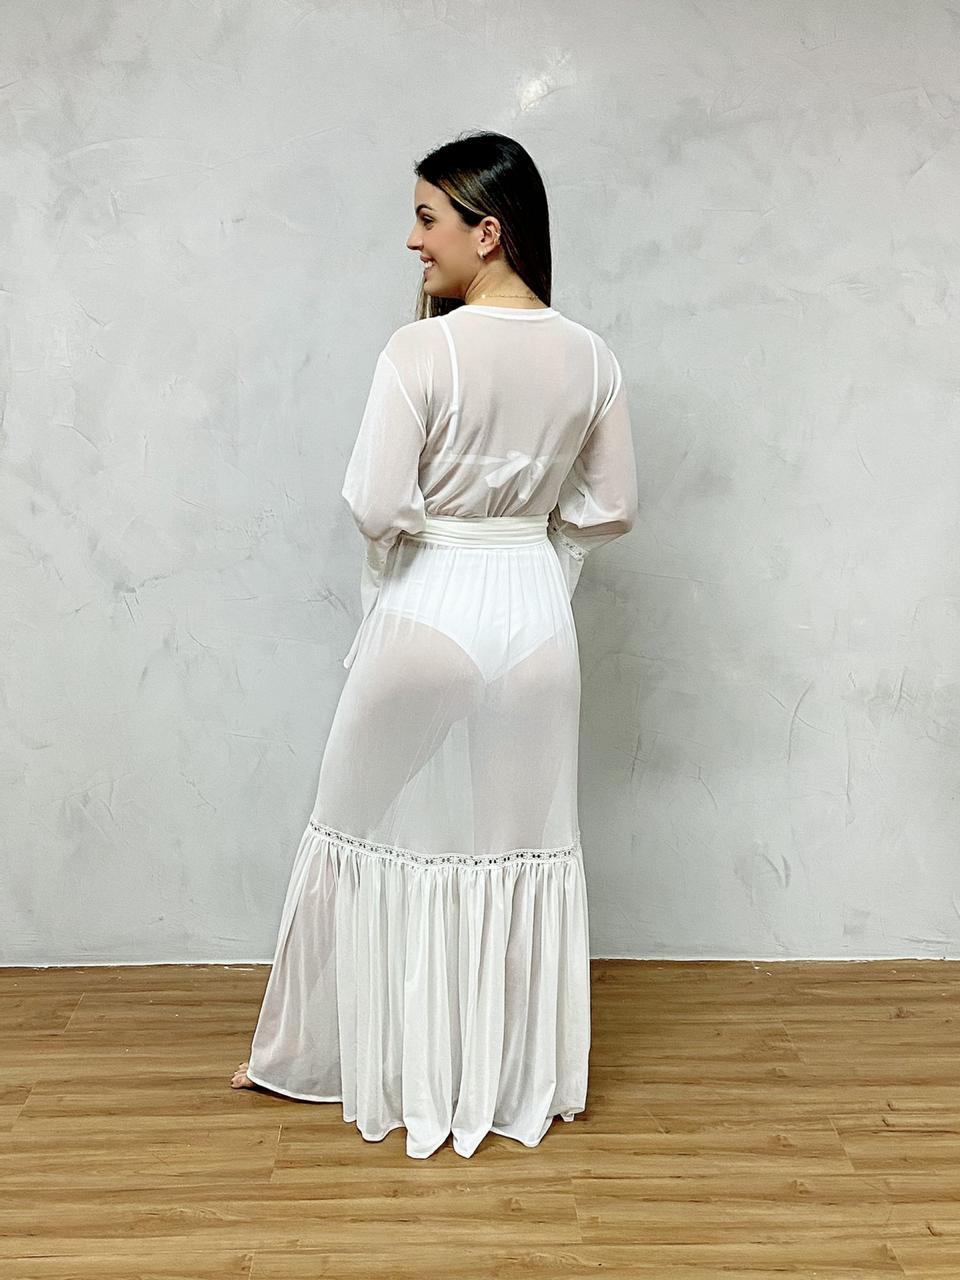 Vestido Longo Manga Grippy Flare Branco   - RMCE BRAZIL